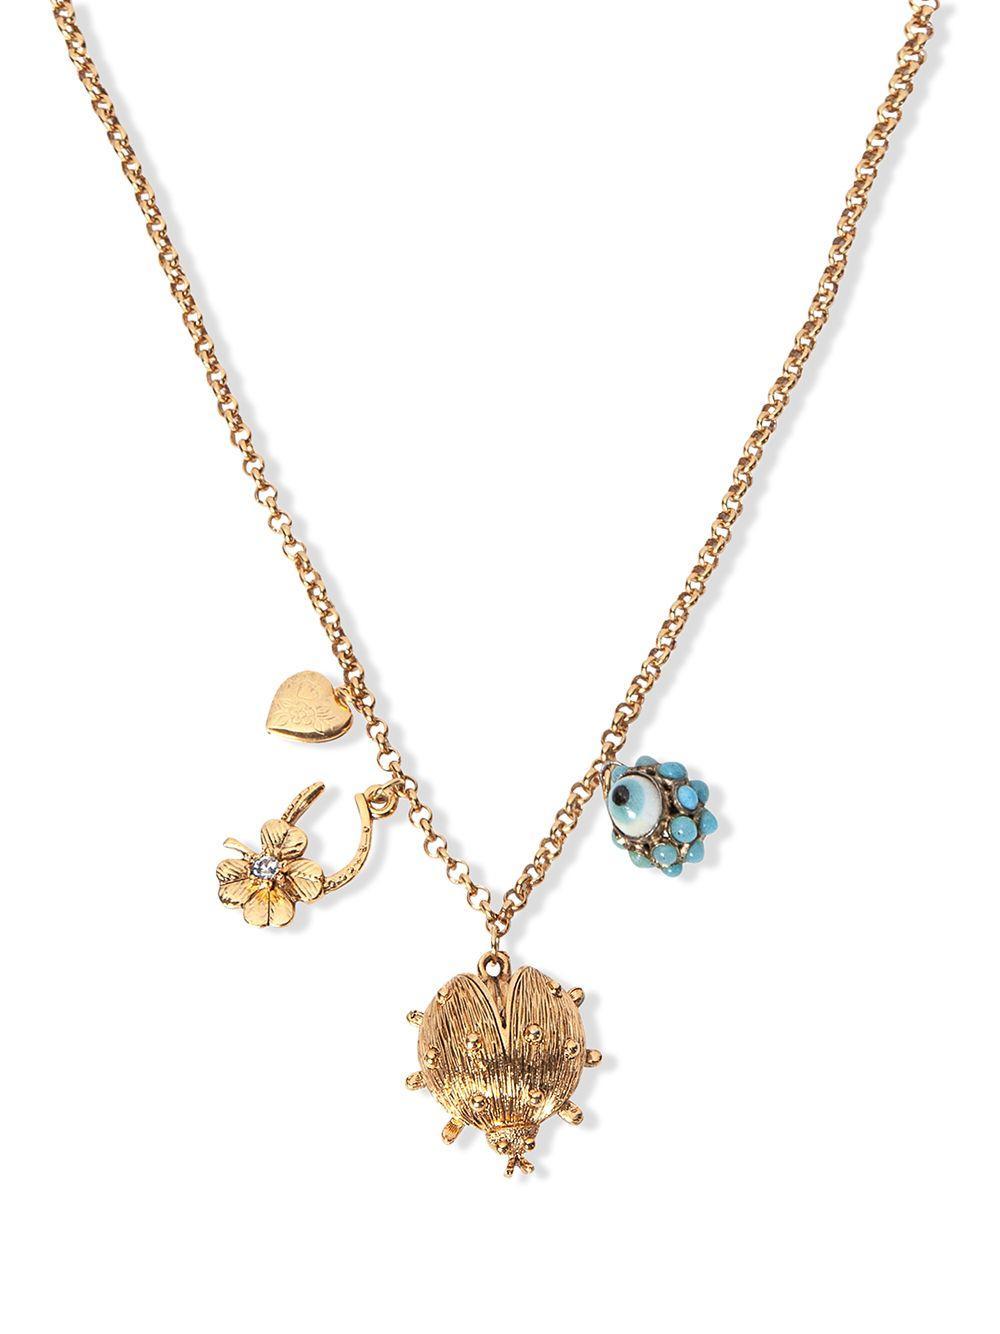 Marquita Charm Necklace Item # 111PA16